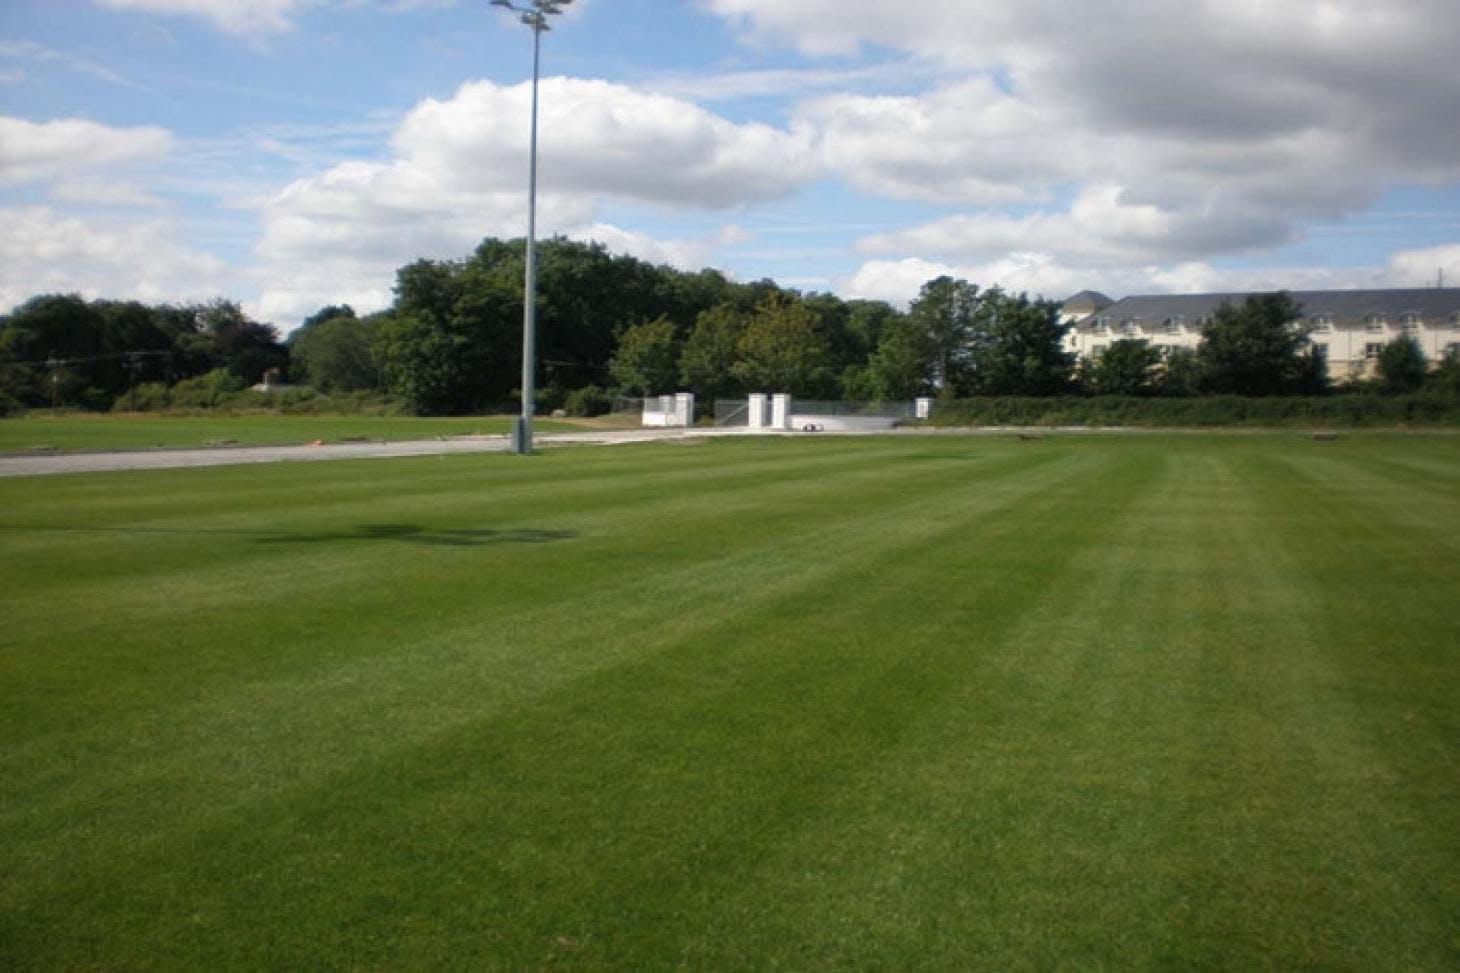 Castleknock GAA Club Training | Astroturf gaa pitch